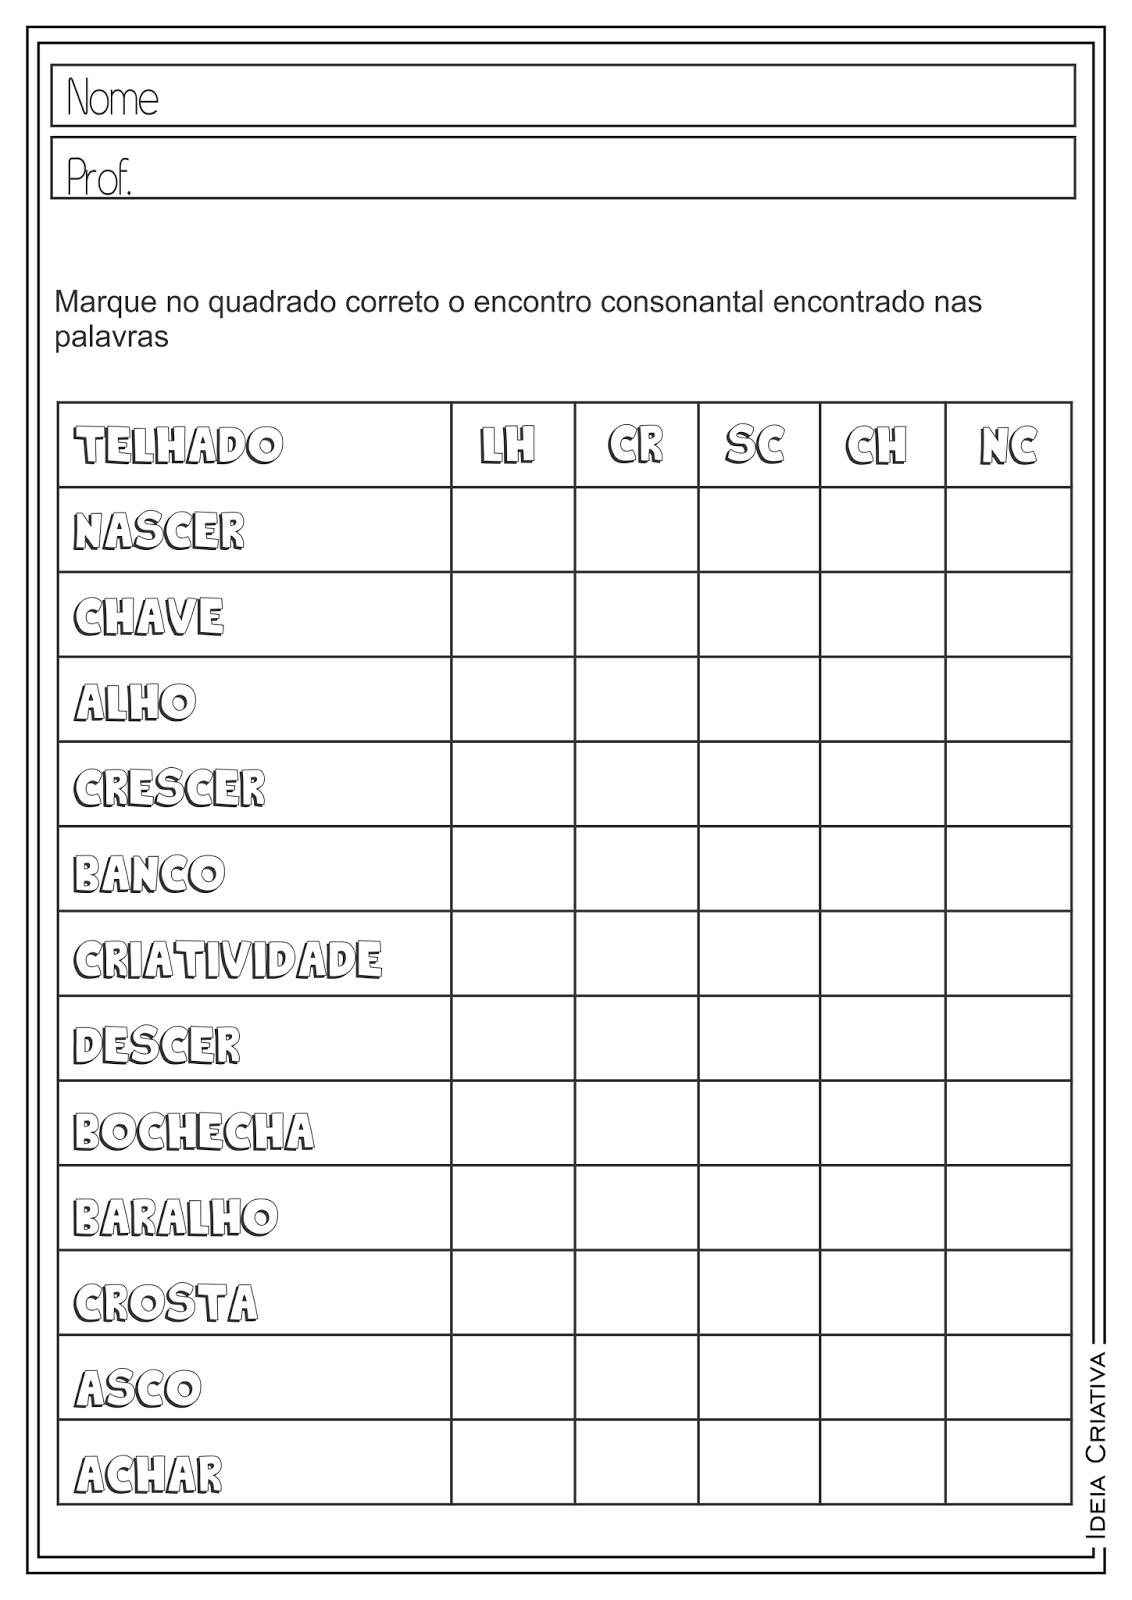 Atividades Educativas Língua Portuguesa Encontros Consonantais para Ensino Fundamental